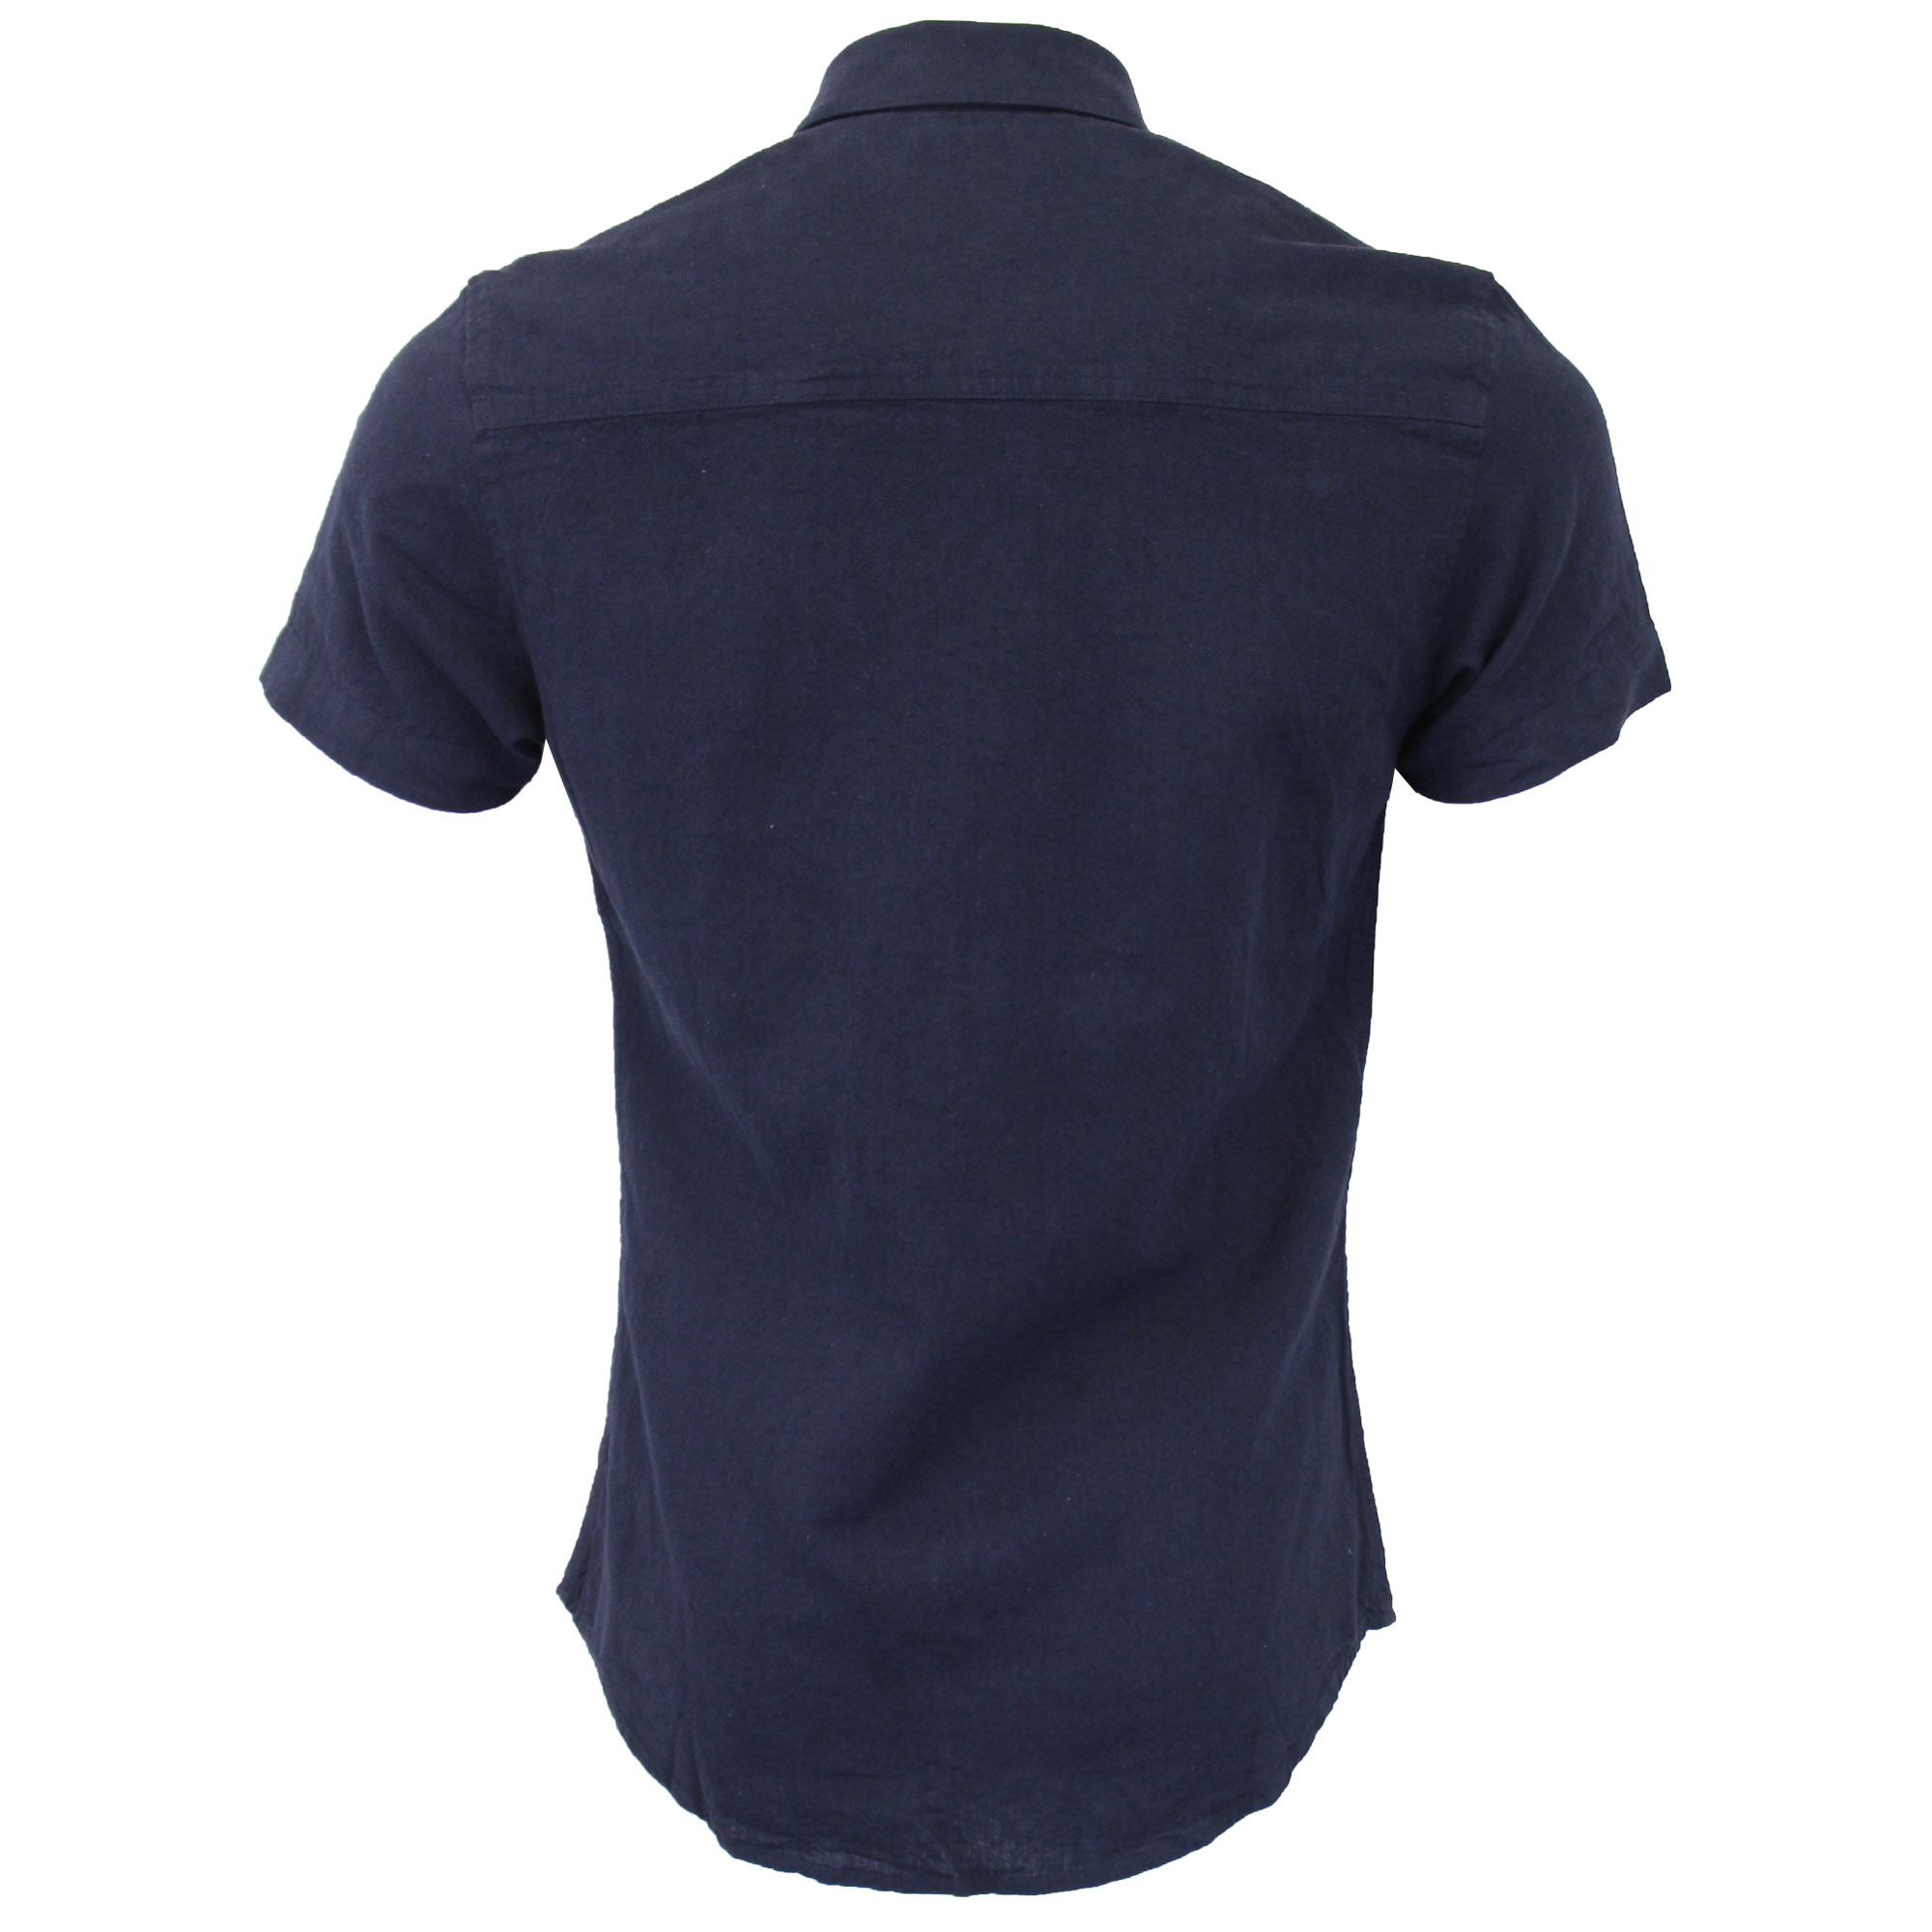 Mens-Linen-Shirt-Threadbare-Short-Sleeved-Brave-Soul-Collared-Casual-Summer-New thumbnail 17